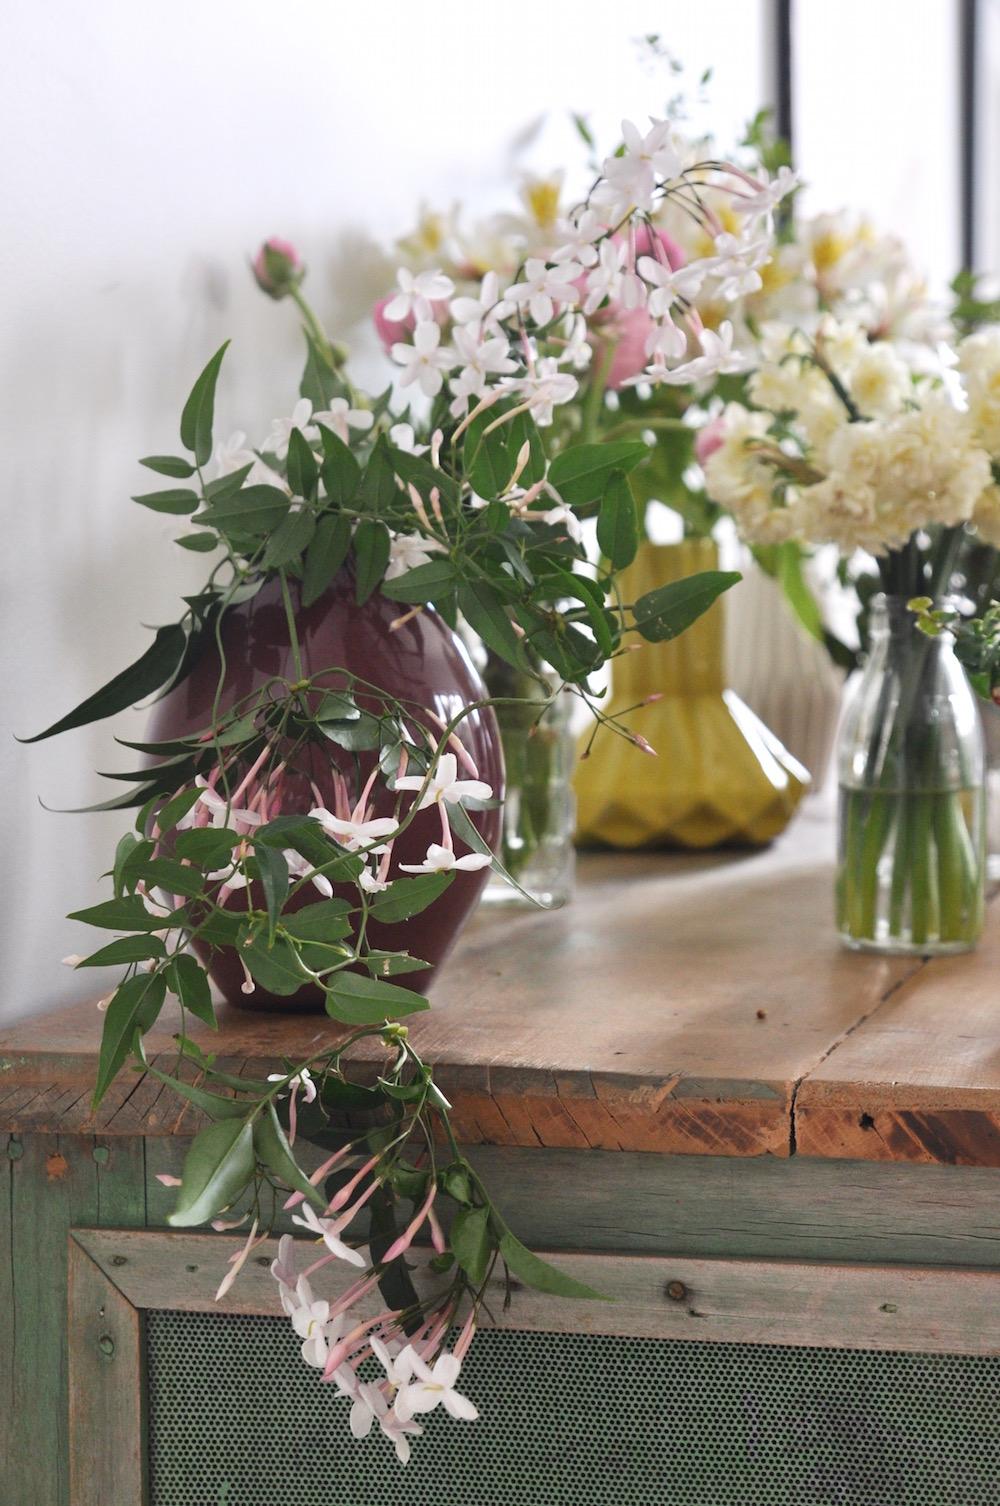 urban jungle bloggers, plants & flowers;